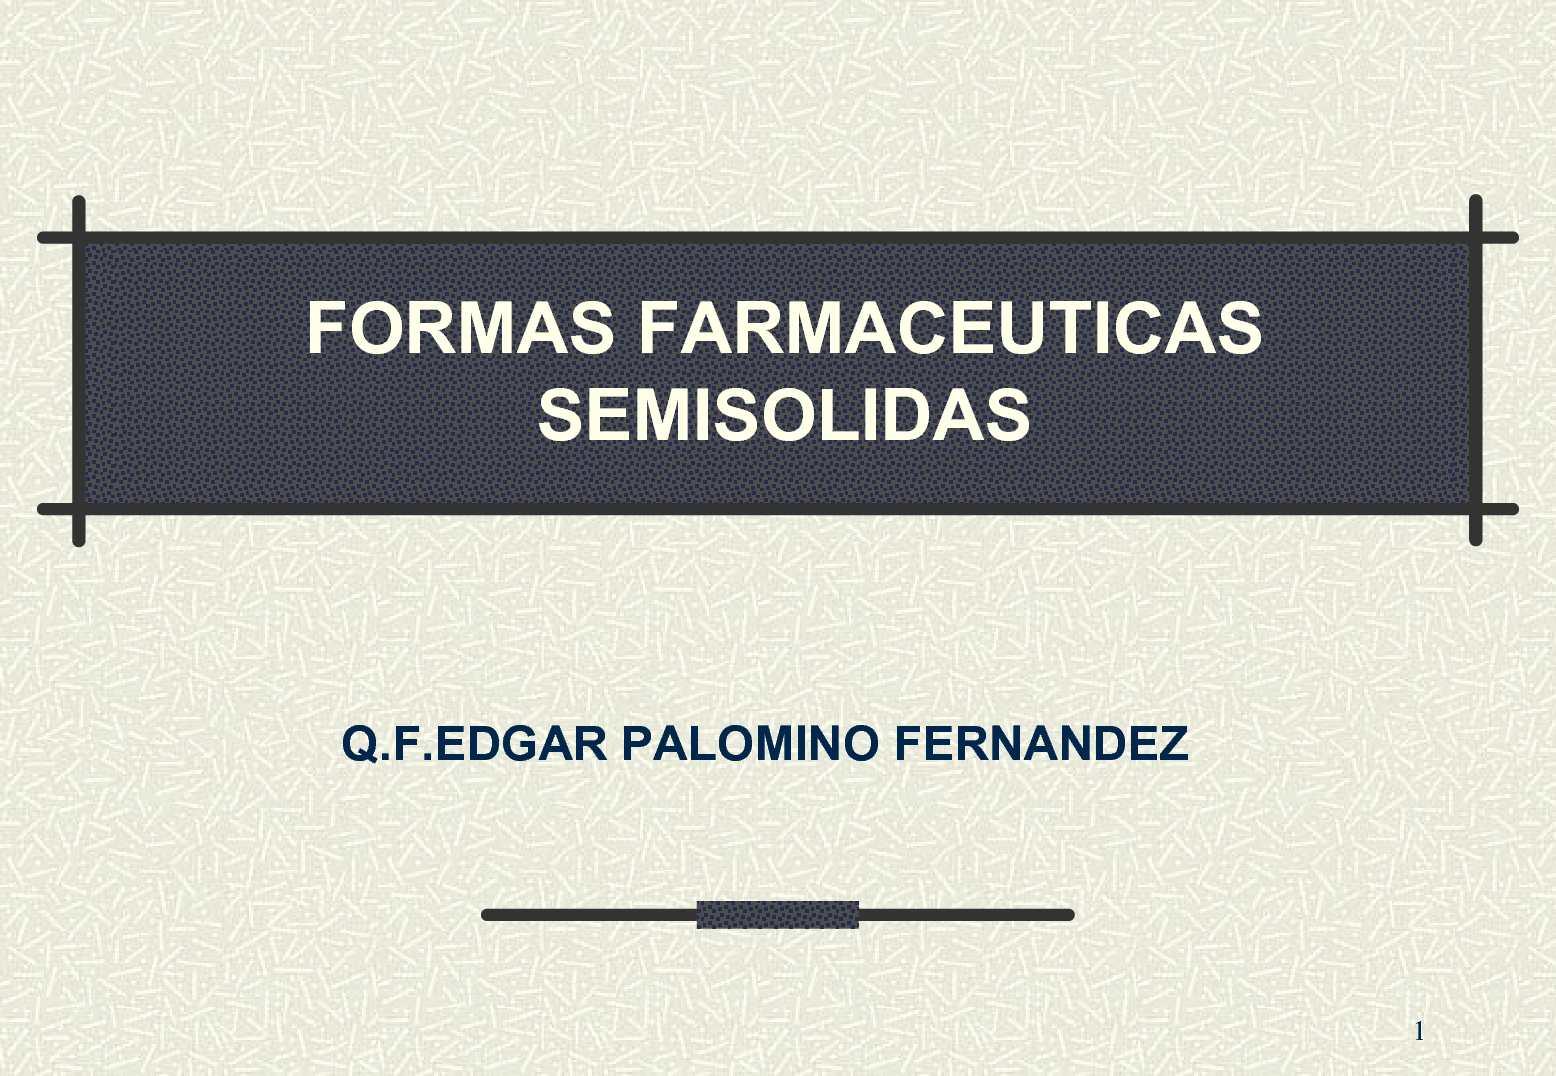 Formas farmaceuticas ventajas y desventajas pdf